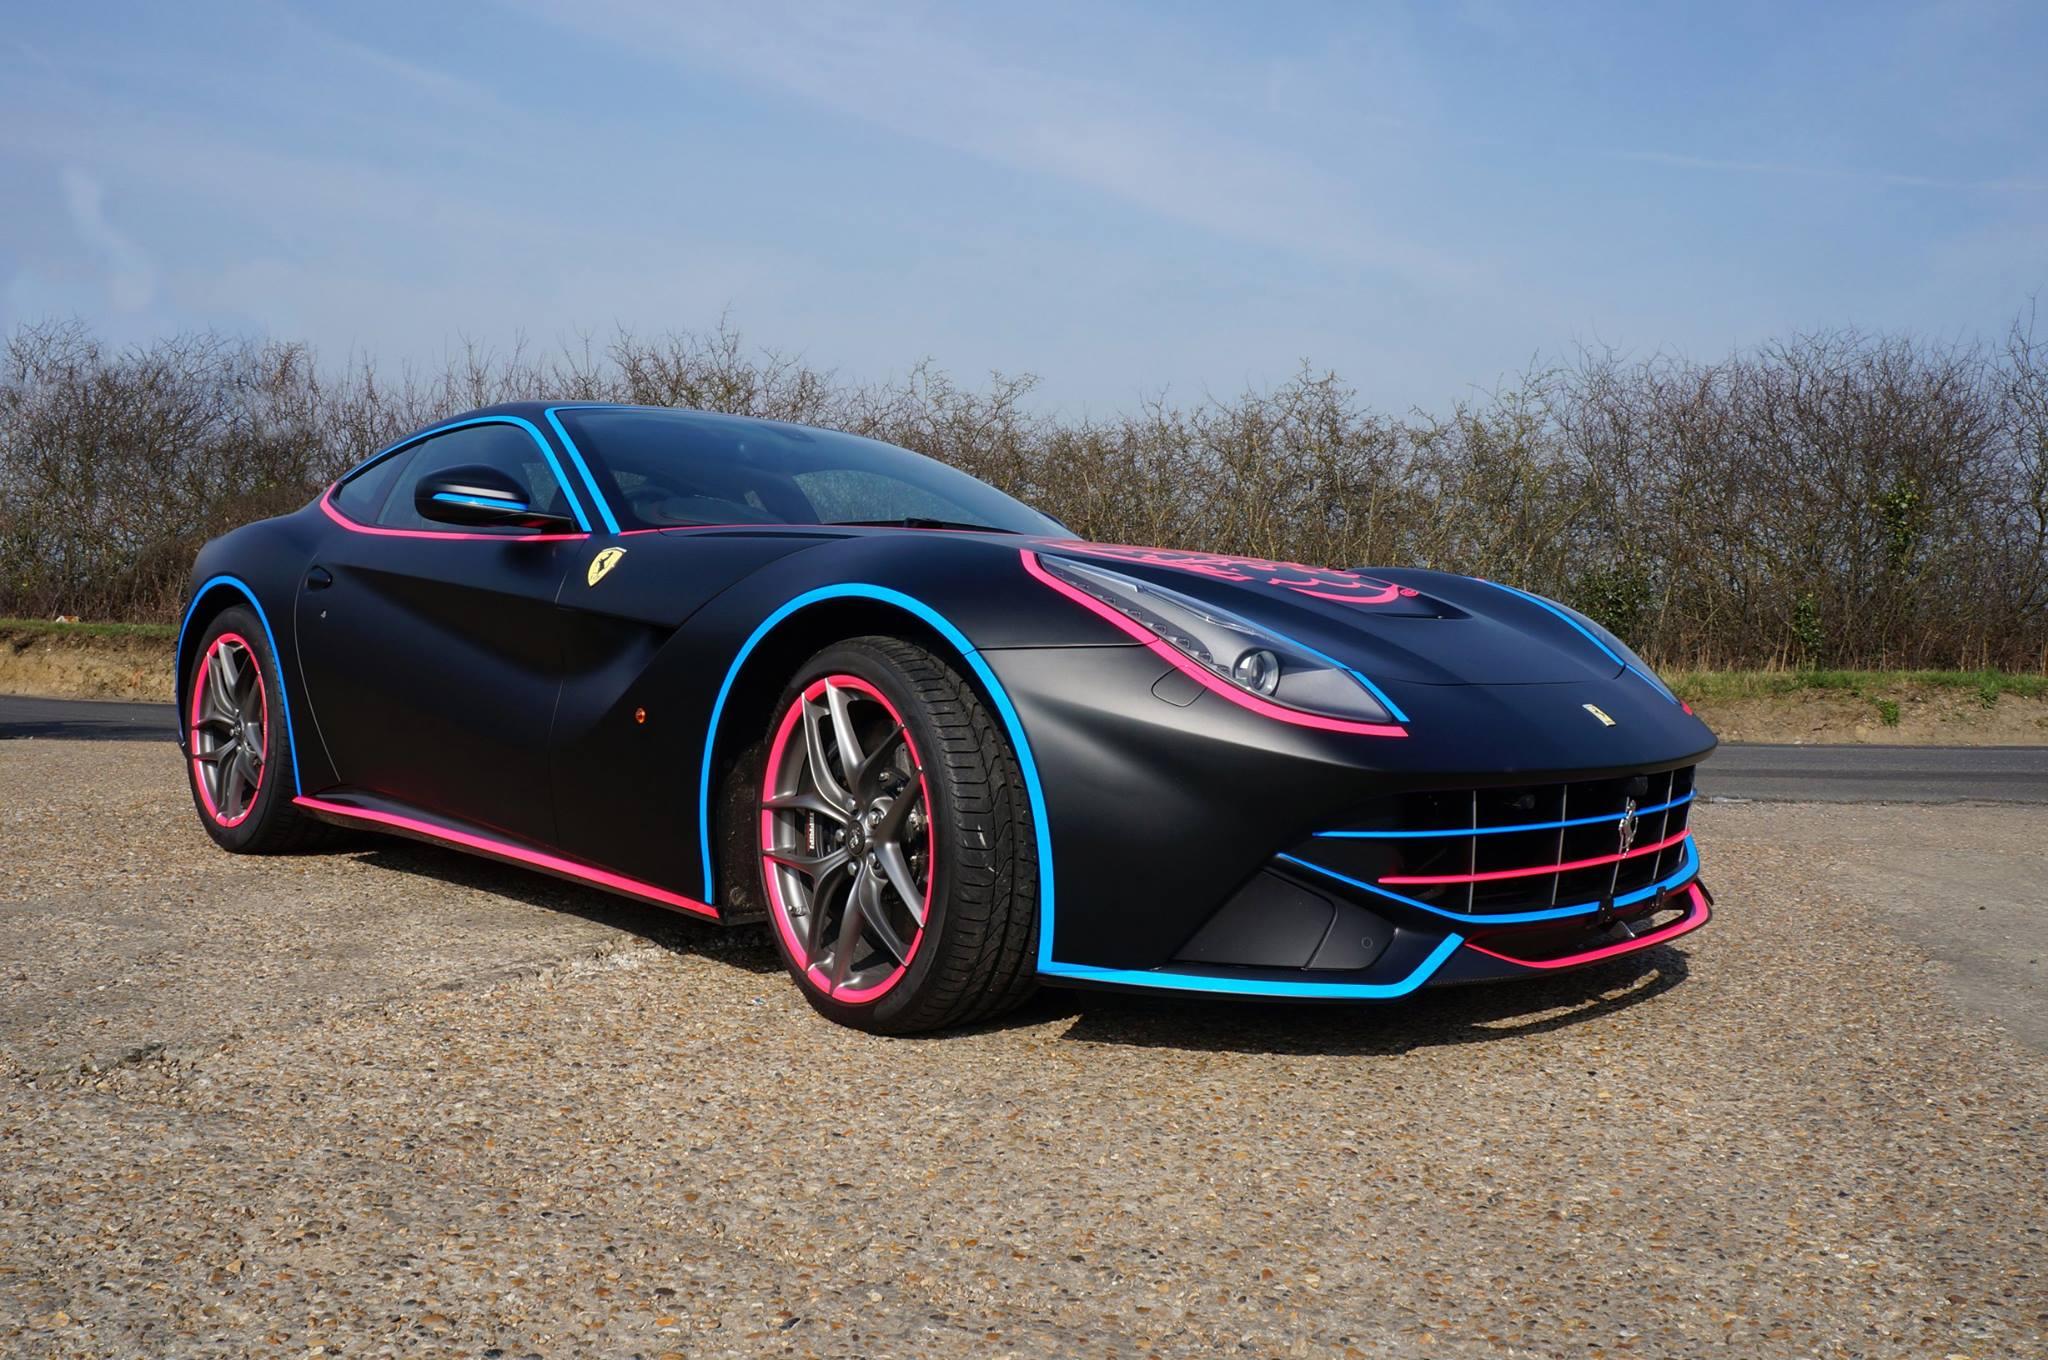 2014 Gumball 3000 Rally Wrap: Ferrari F12 Gets Miami Vice ...